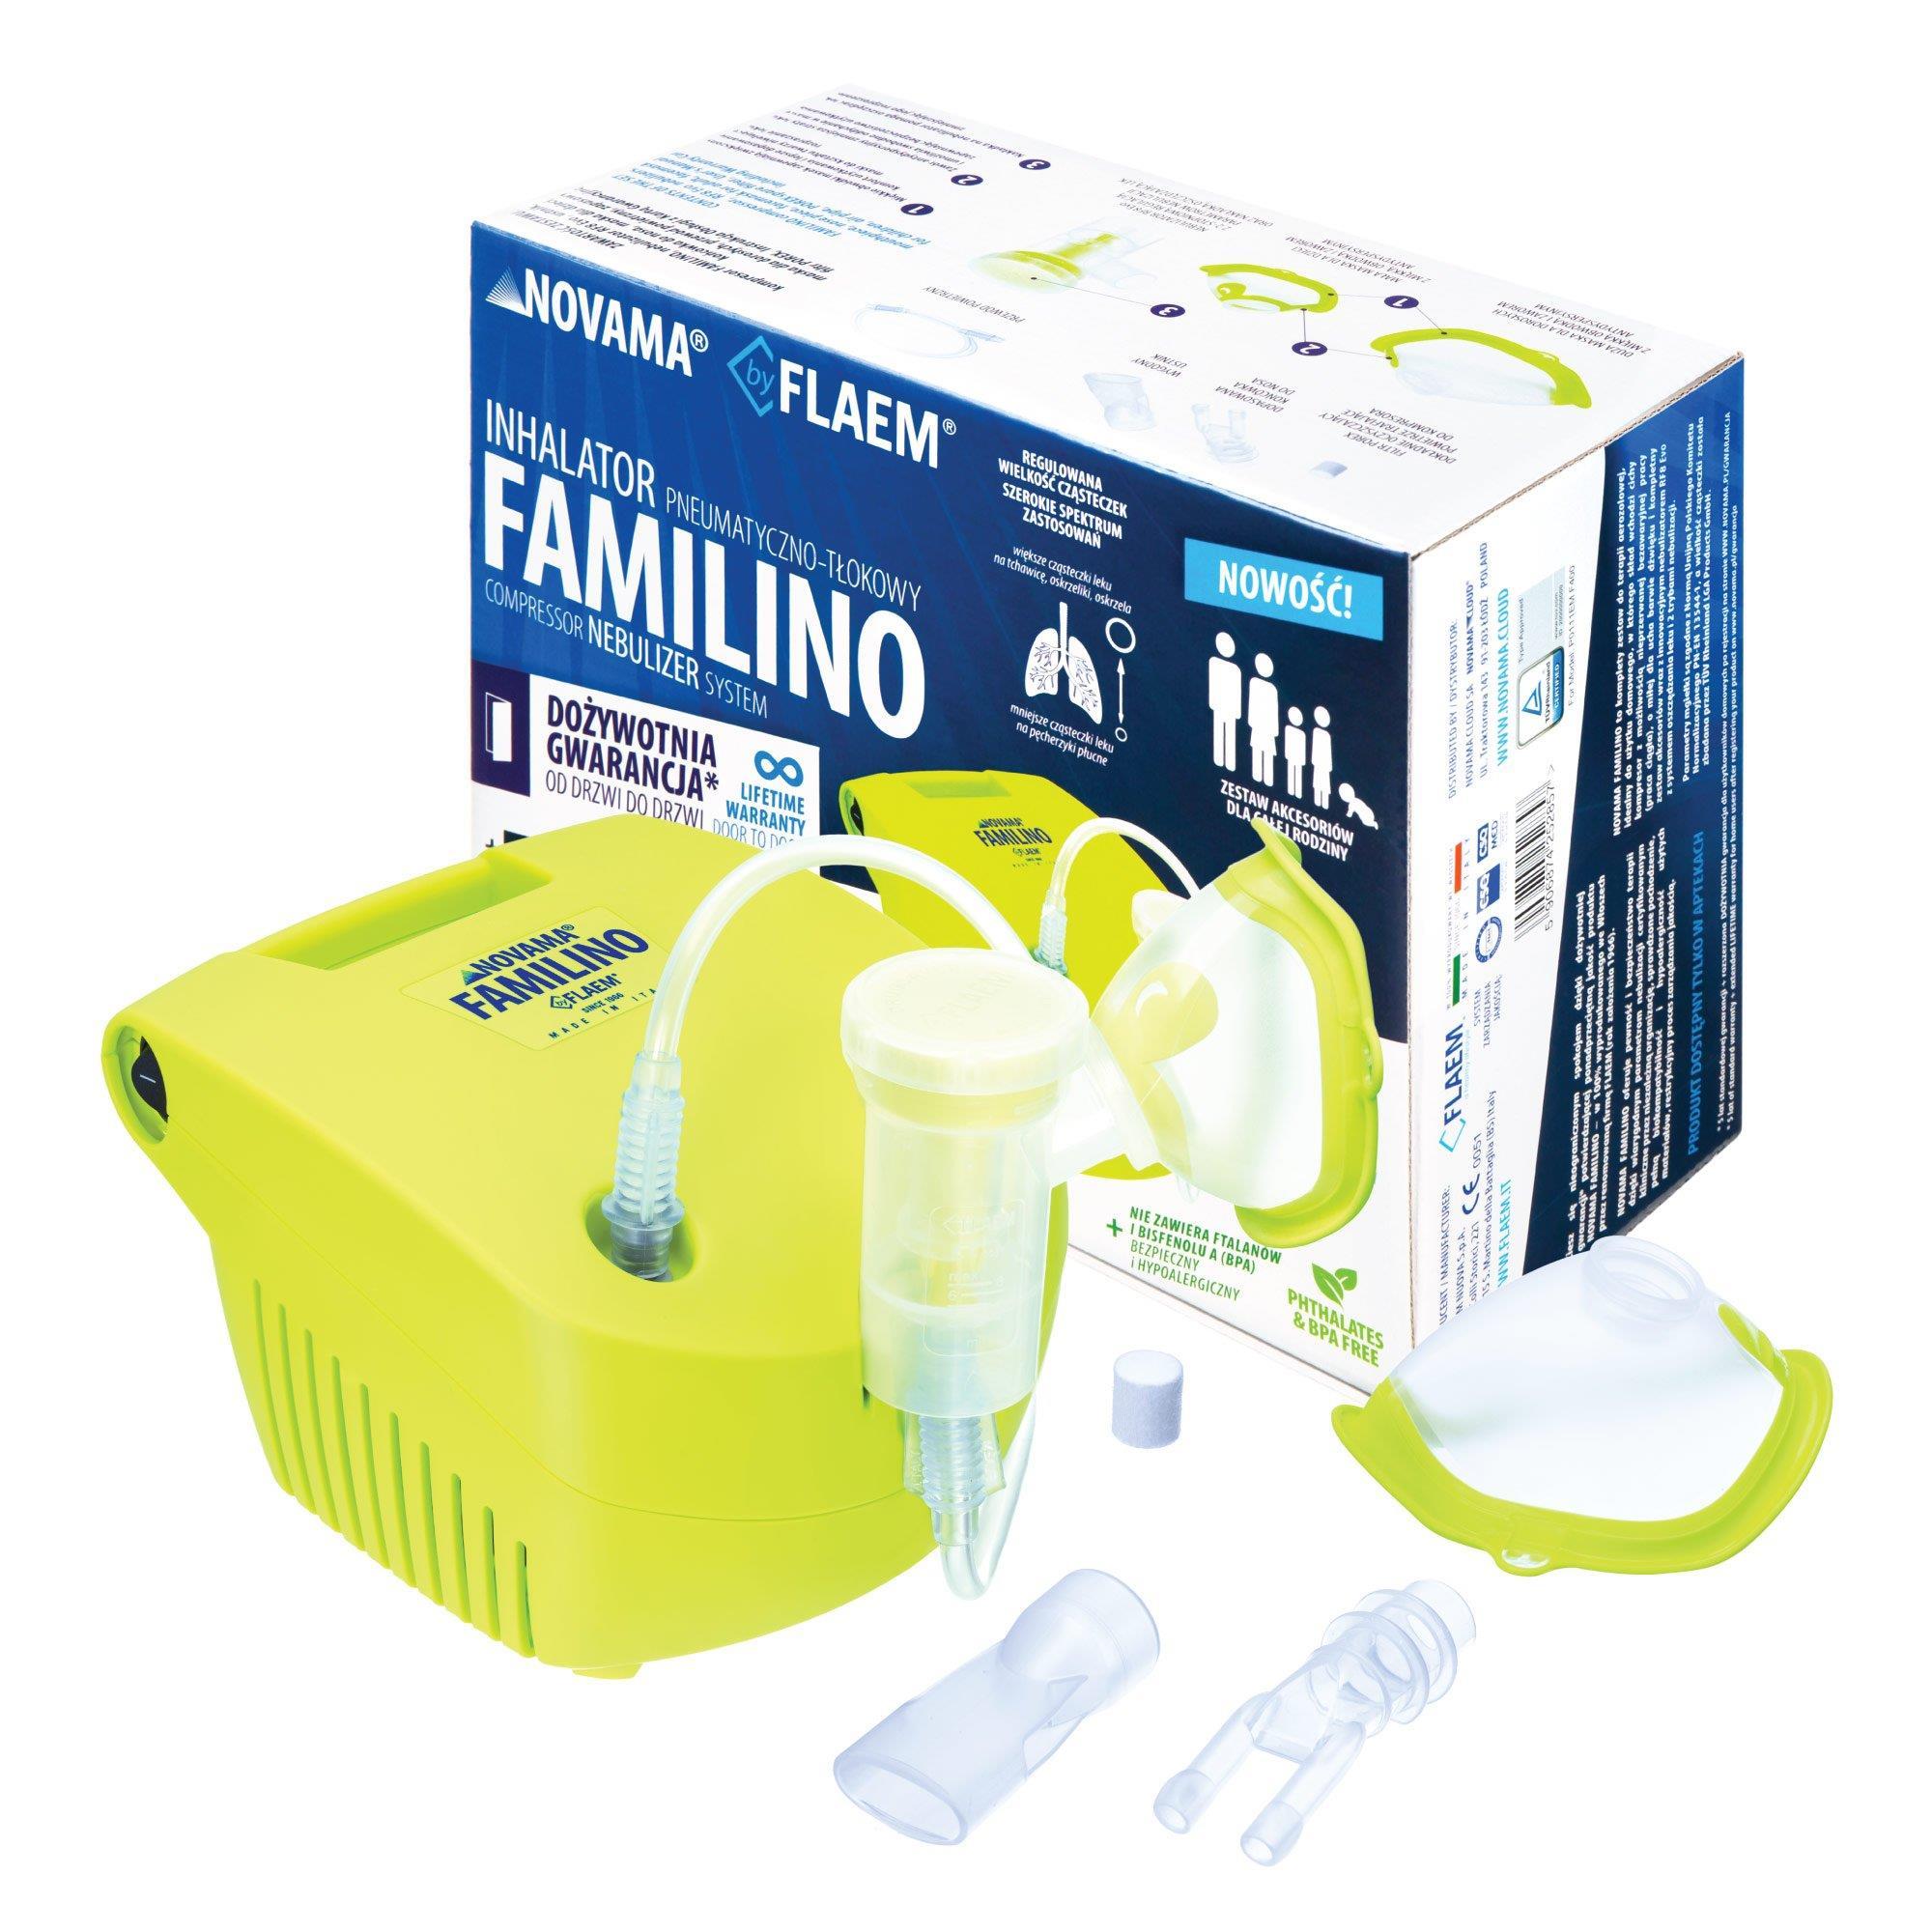 Inhaler pneumatic piston NOVAMA Familino by Flaem (lime color) UISNOMINH0001 inhalators